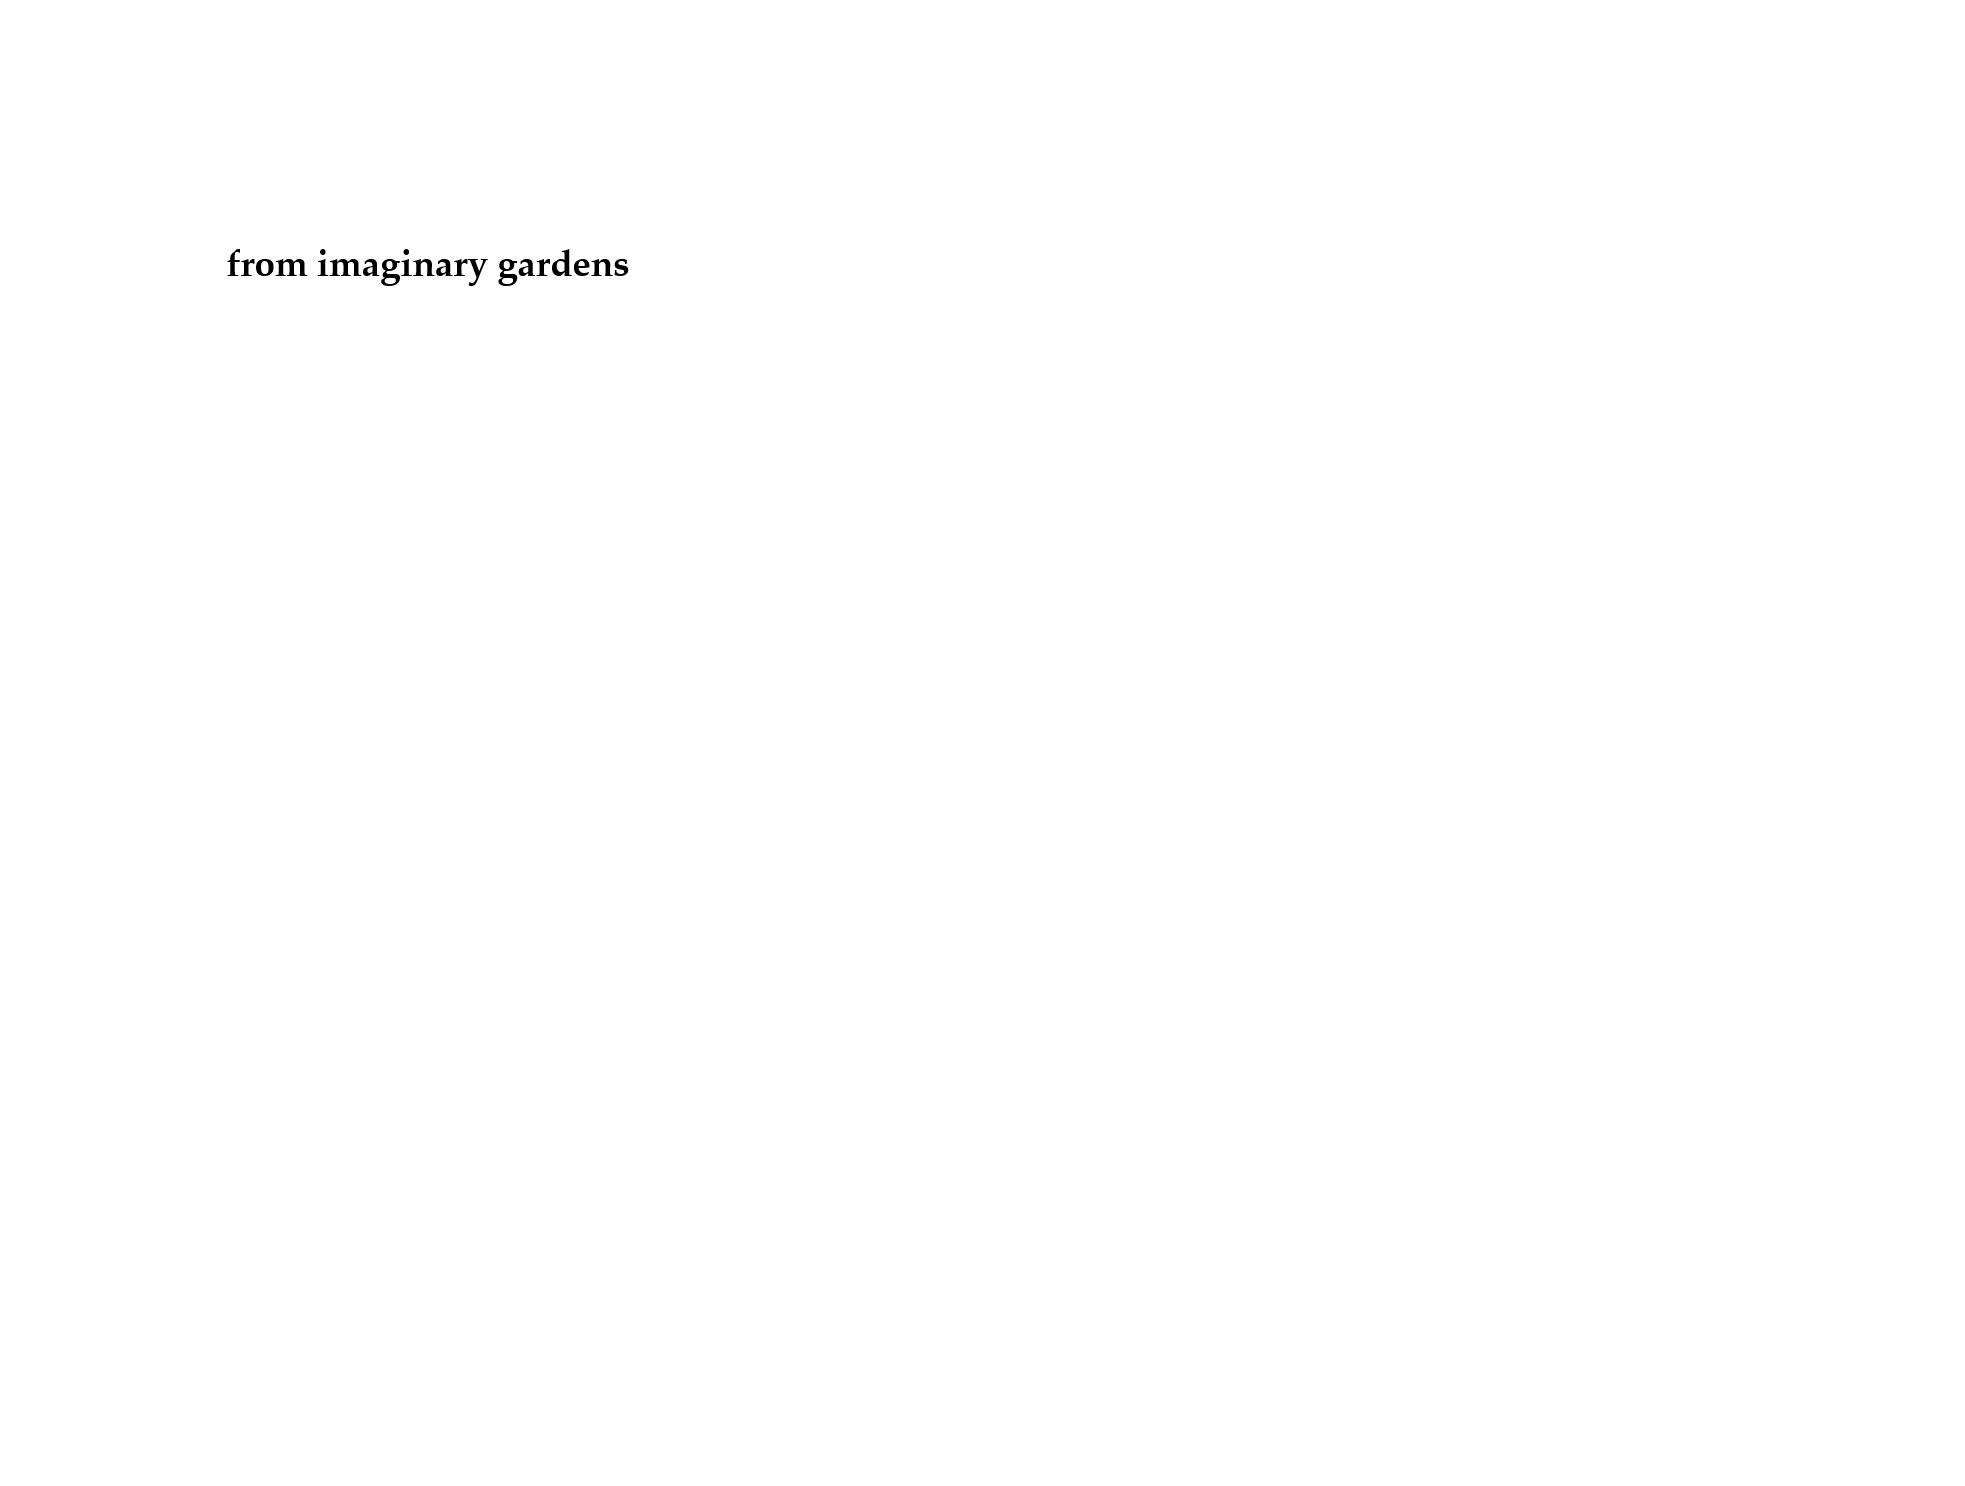 from imaginary gardens 1.1 Billy Mills